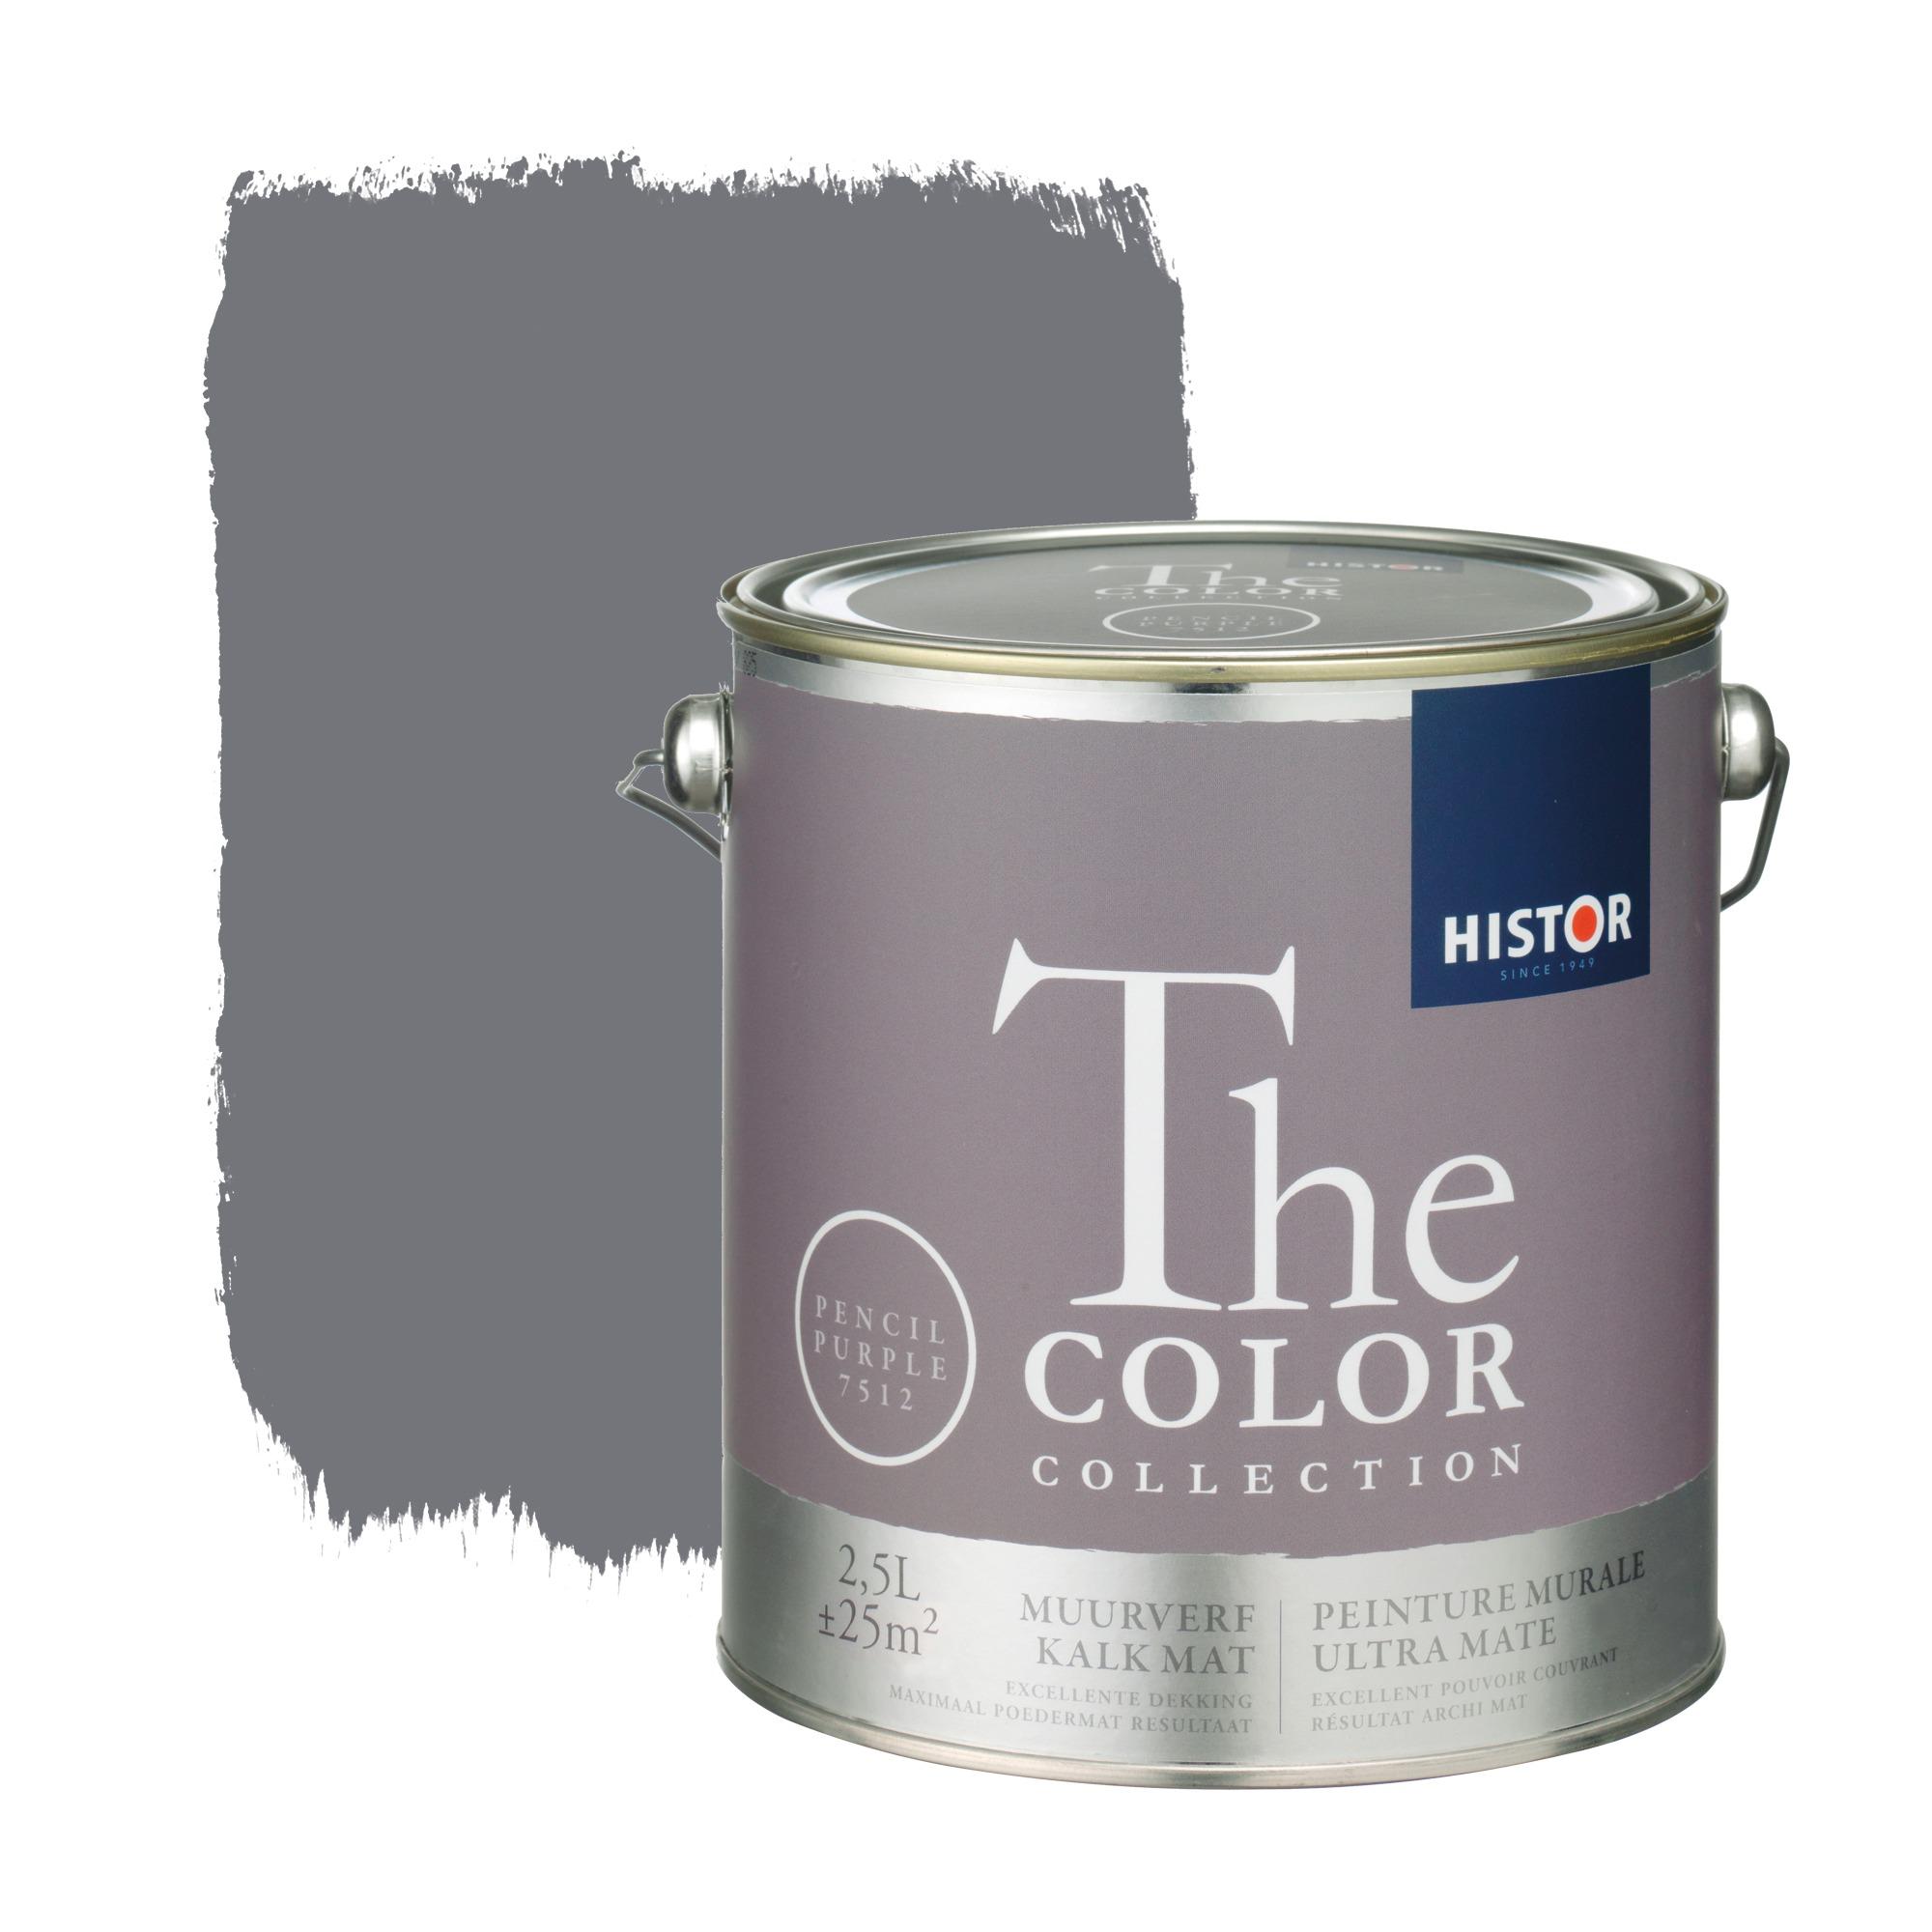 Histor the color collection muurverf kalkmat pencil purple 7512 2,5 l